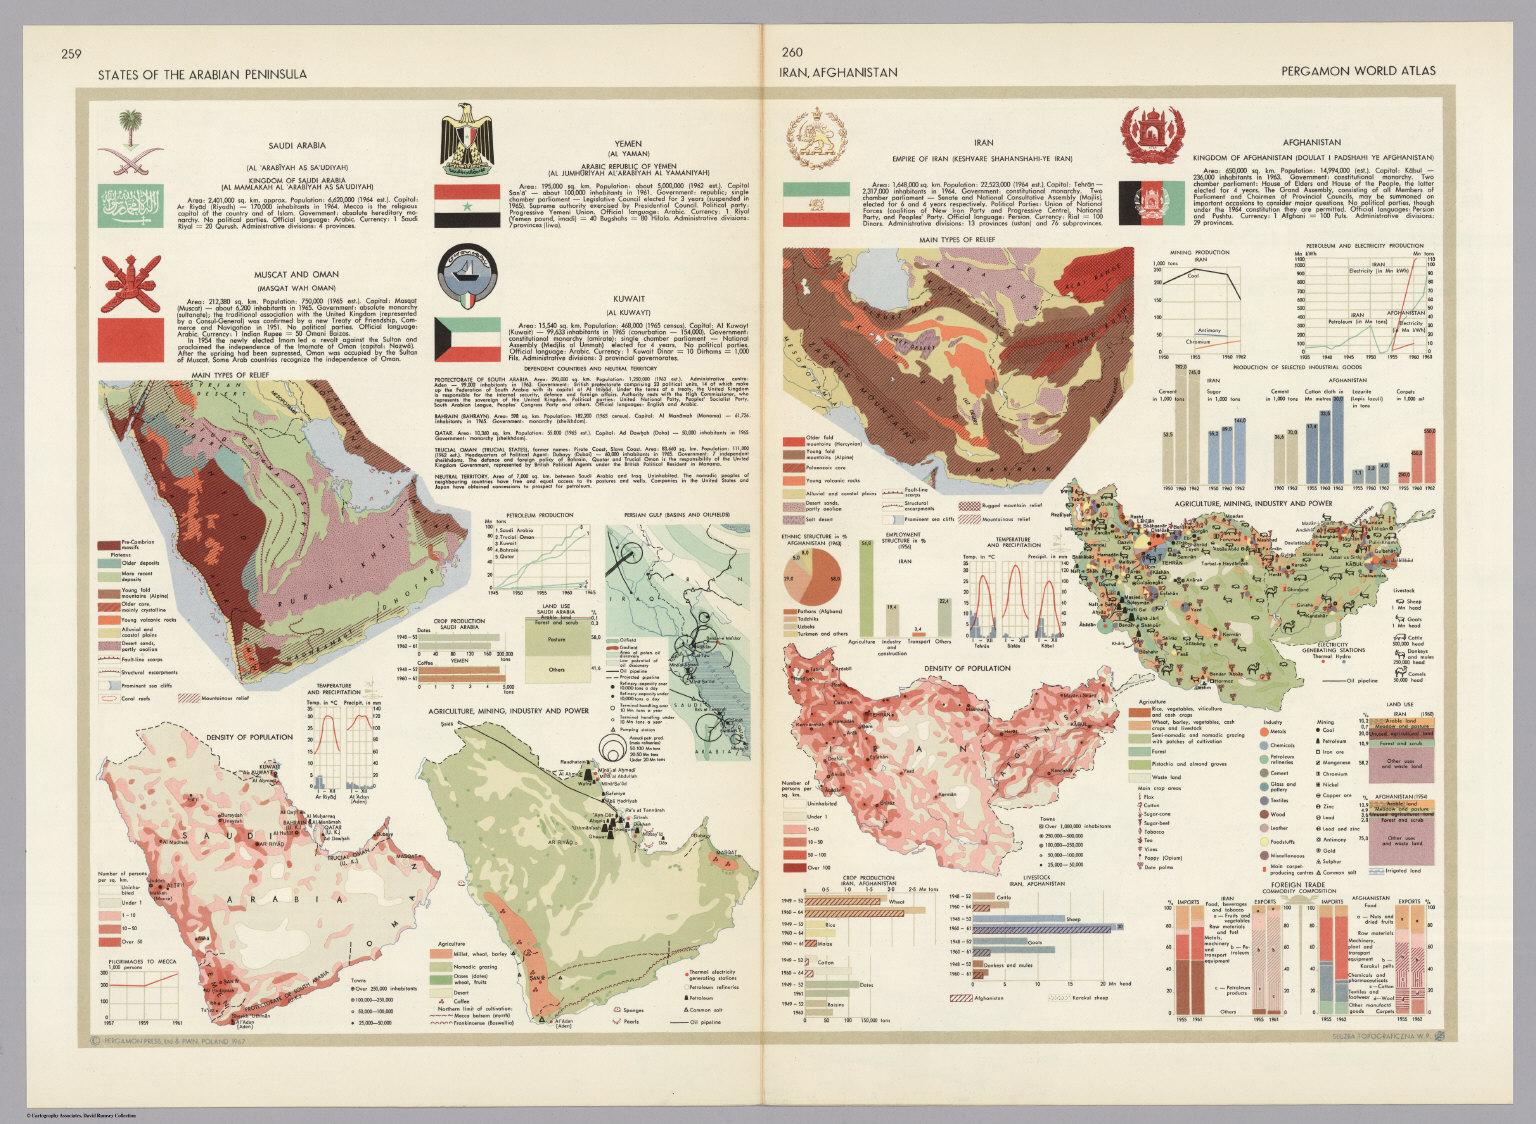 States of the arabian peninsula iran afghanistan pergamon world states of the arabian peninsula iran afghanistan pergamon world atlas gumiabroncs Choice Image